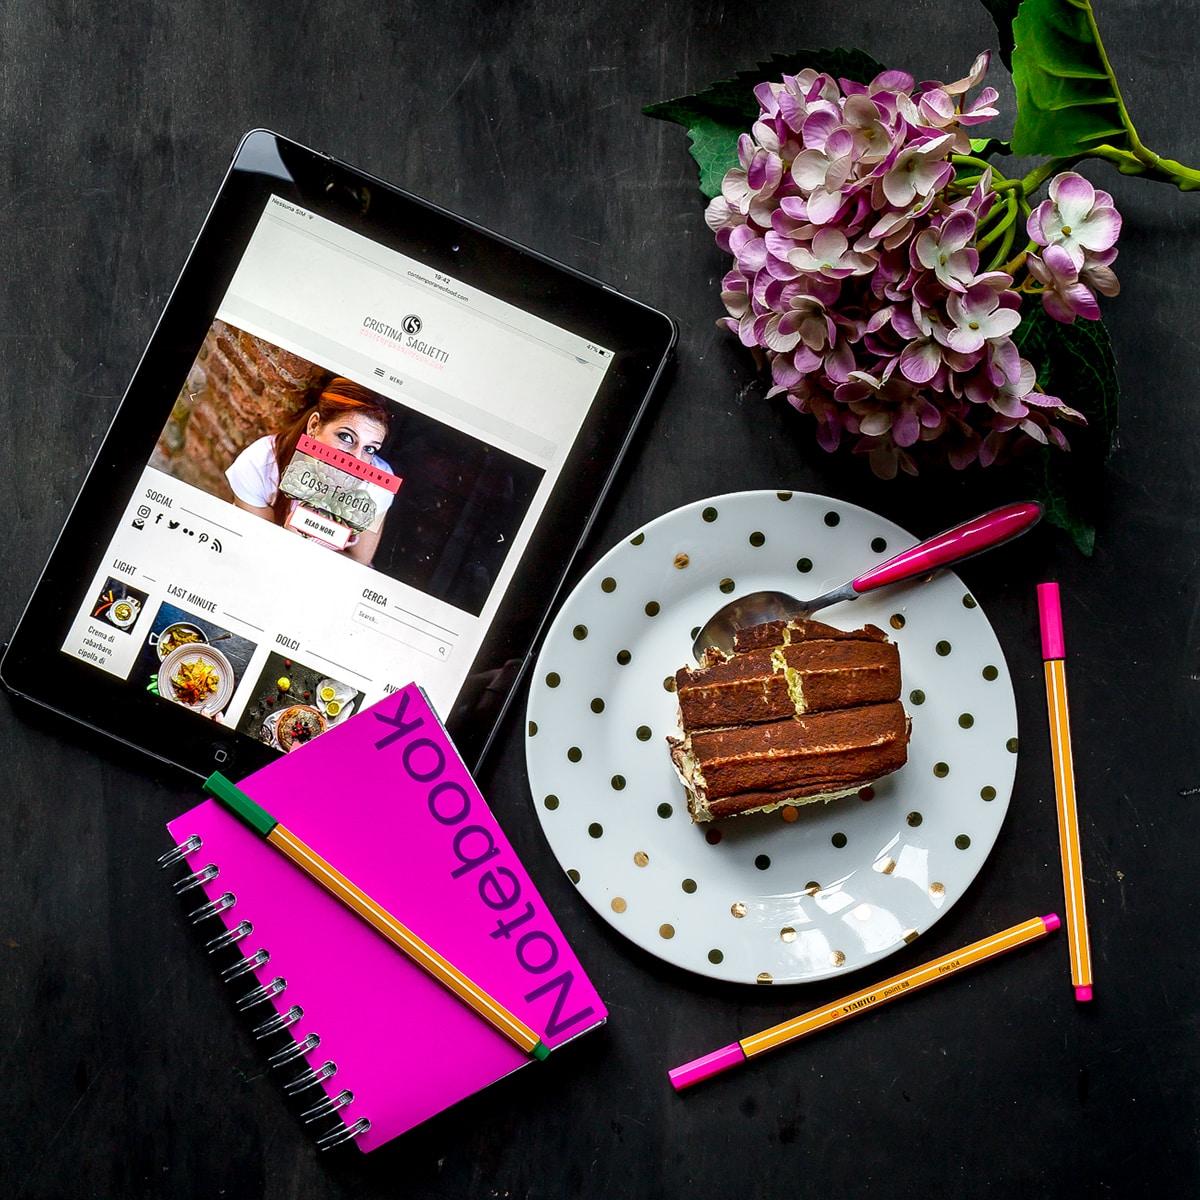 variante-di-tiramisu-lifestyle-ricette-dolci-contemporaneo-food